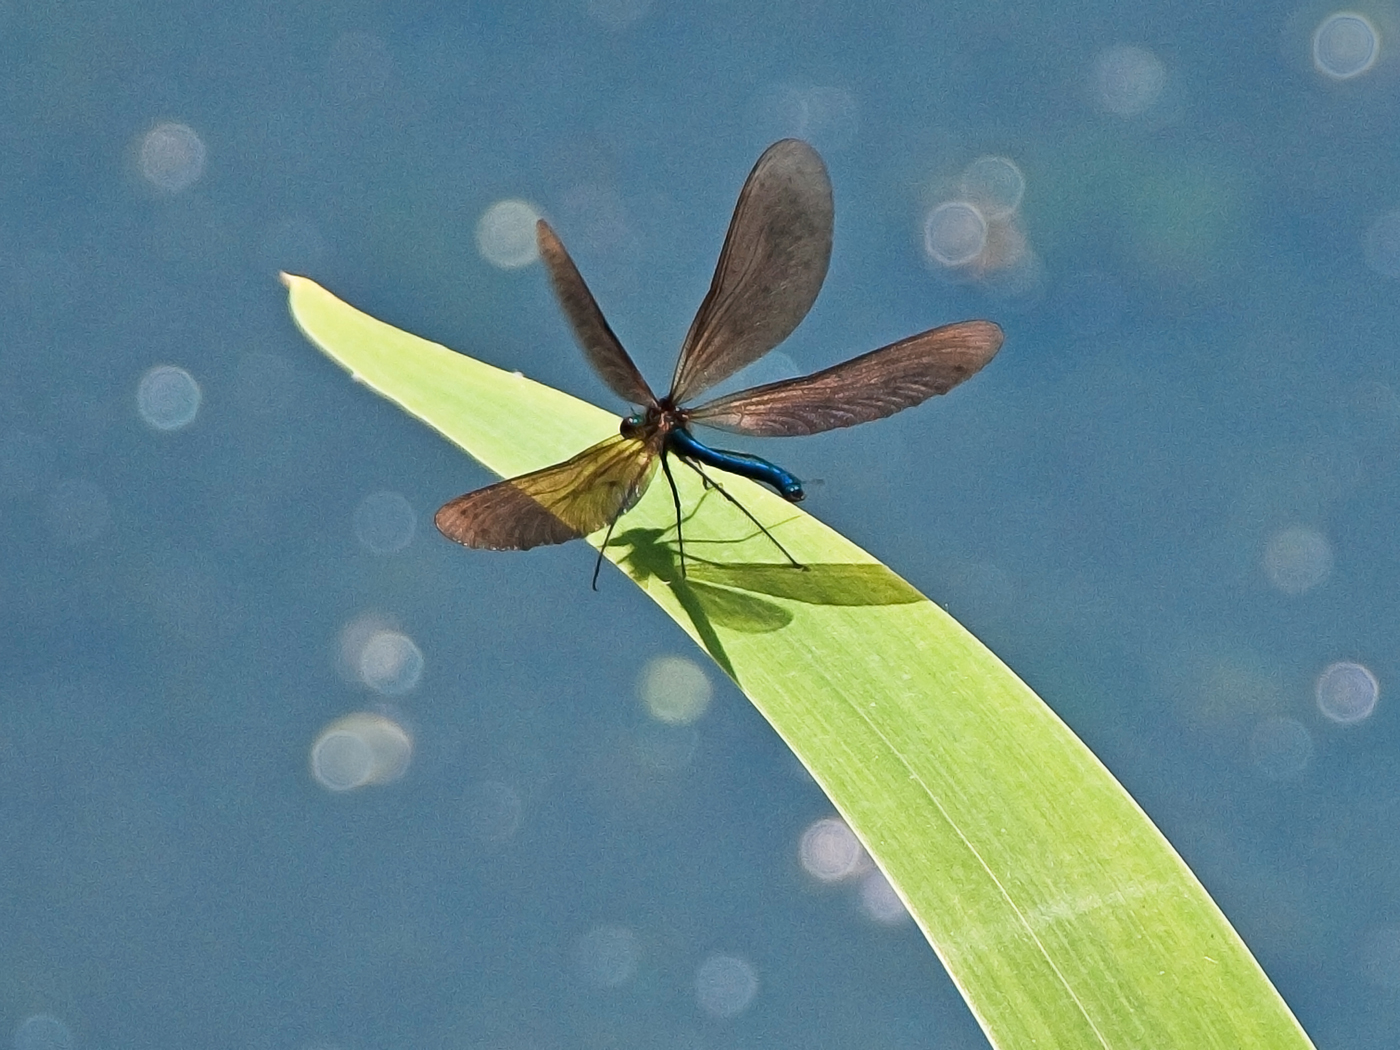 Black Winged Damsel